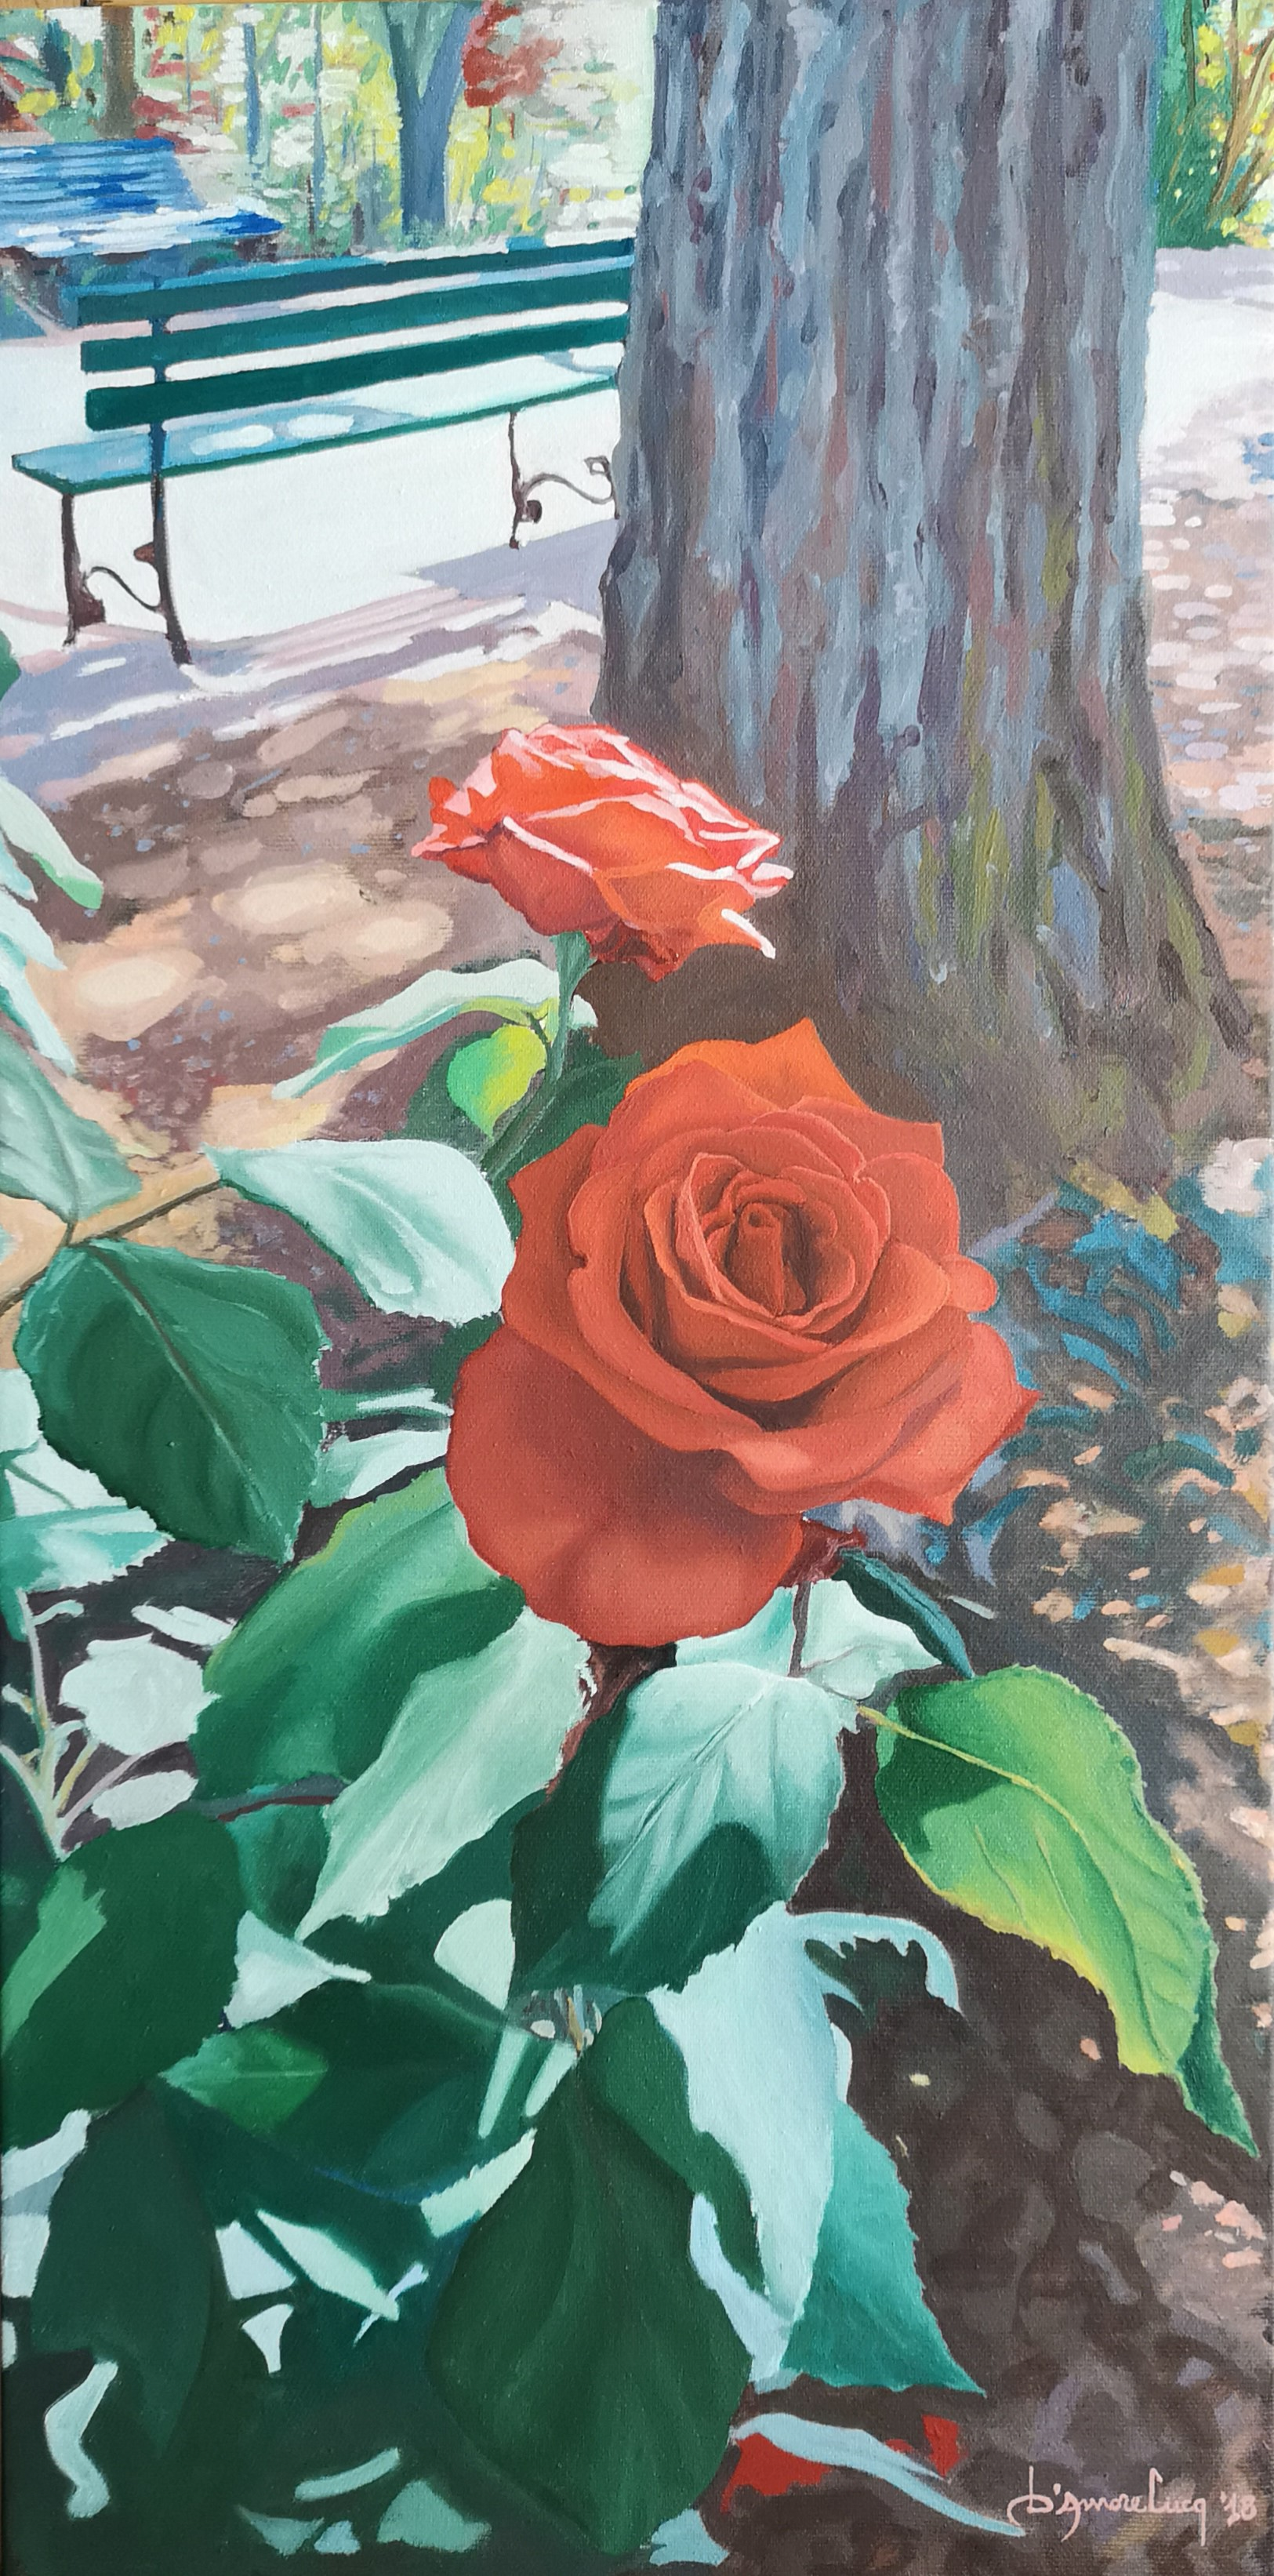 Luca D'Amore – Rose rosse